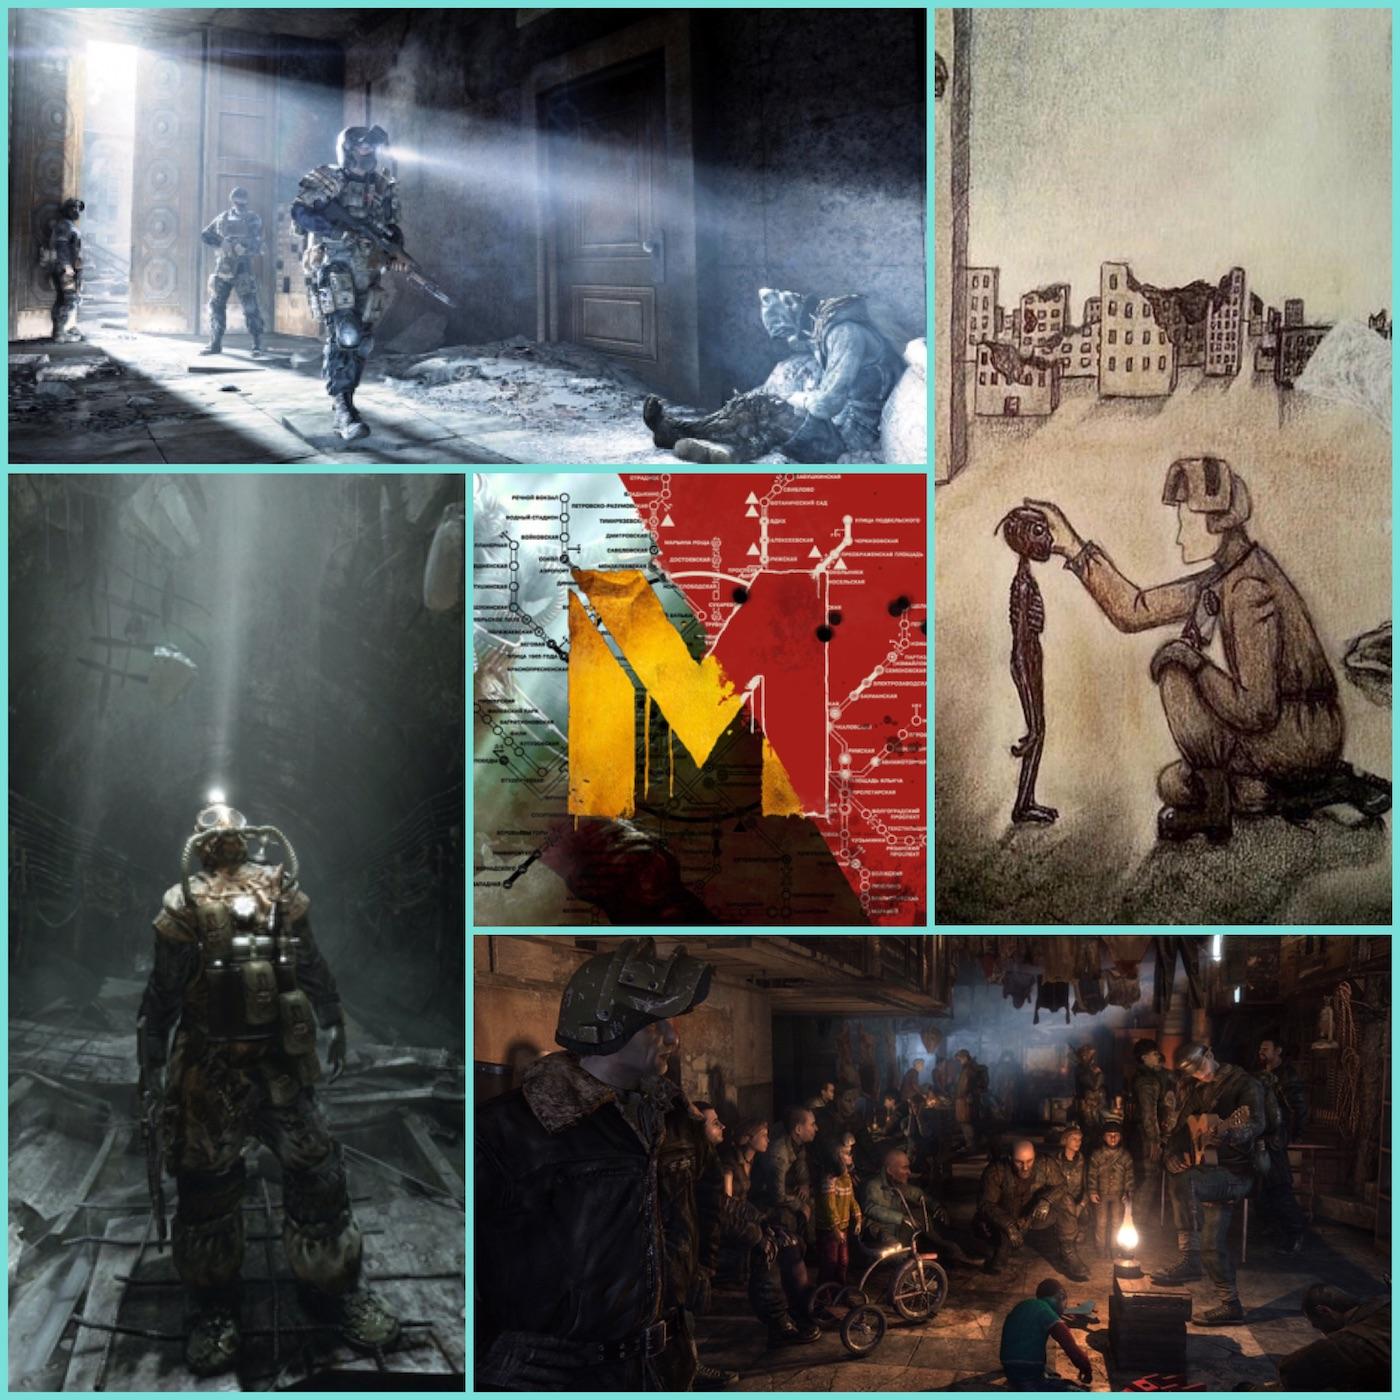 metro-2033-last-light-redux-exodus-4agames-insta-thoughts-considerazioni-riflessioni-gaming